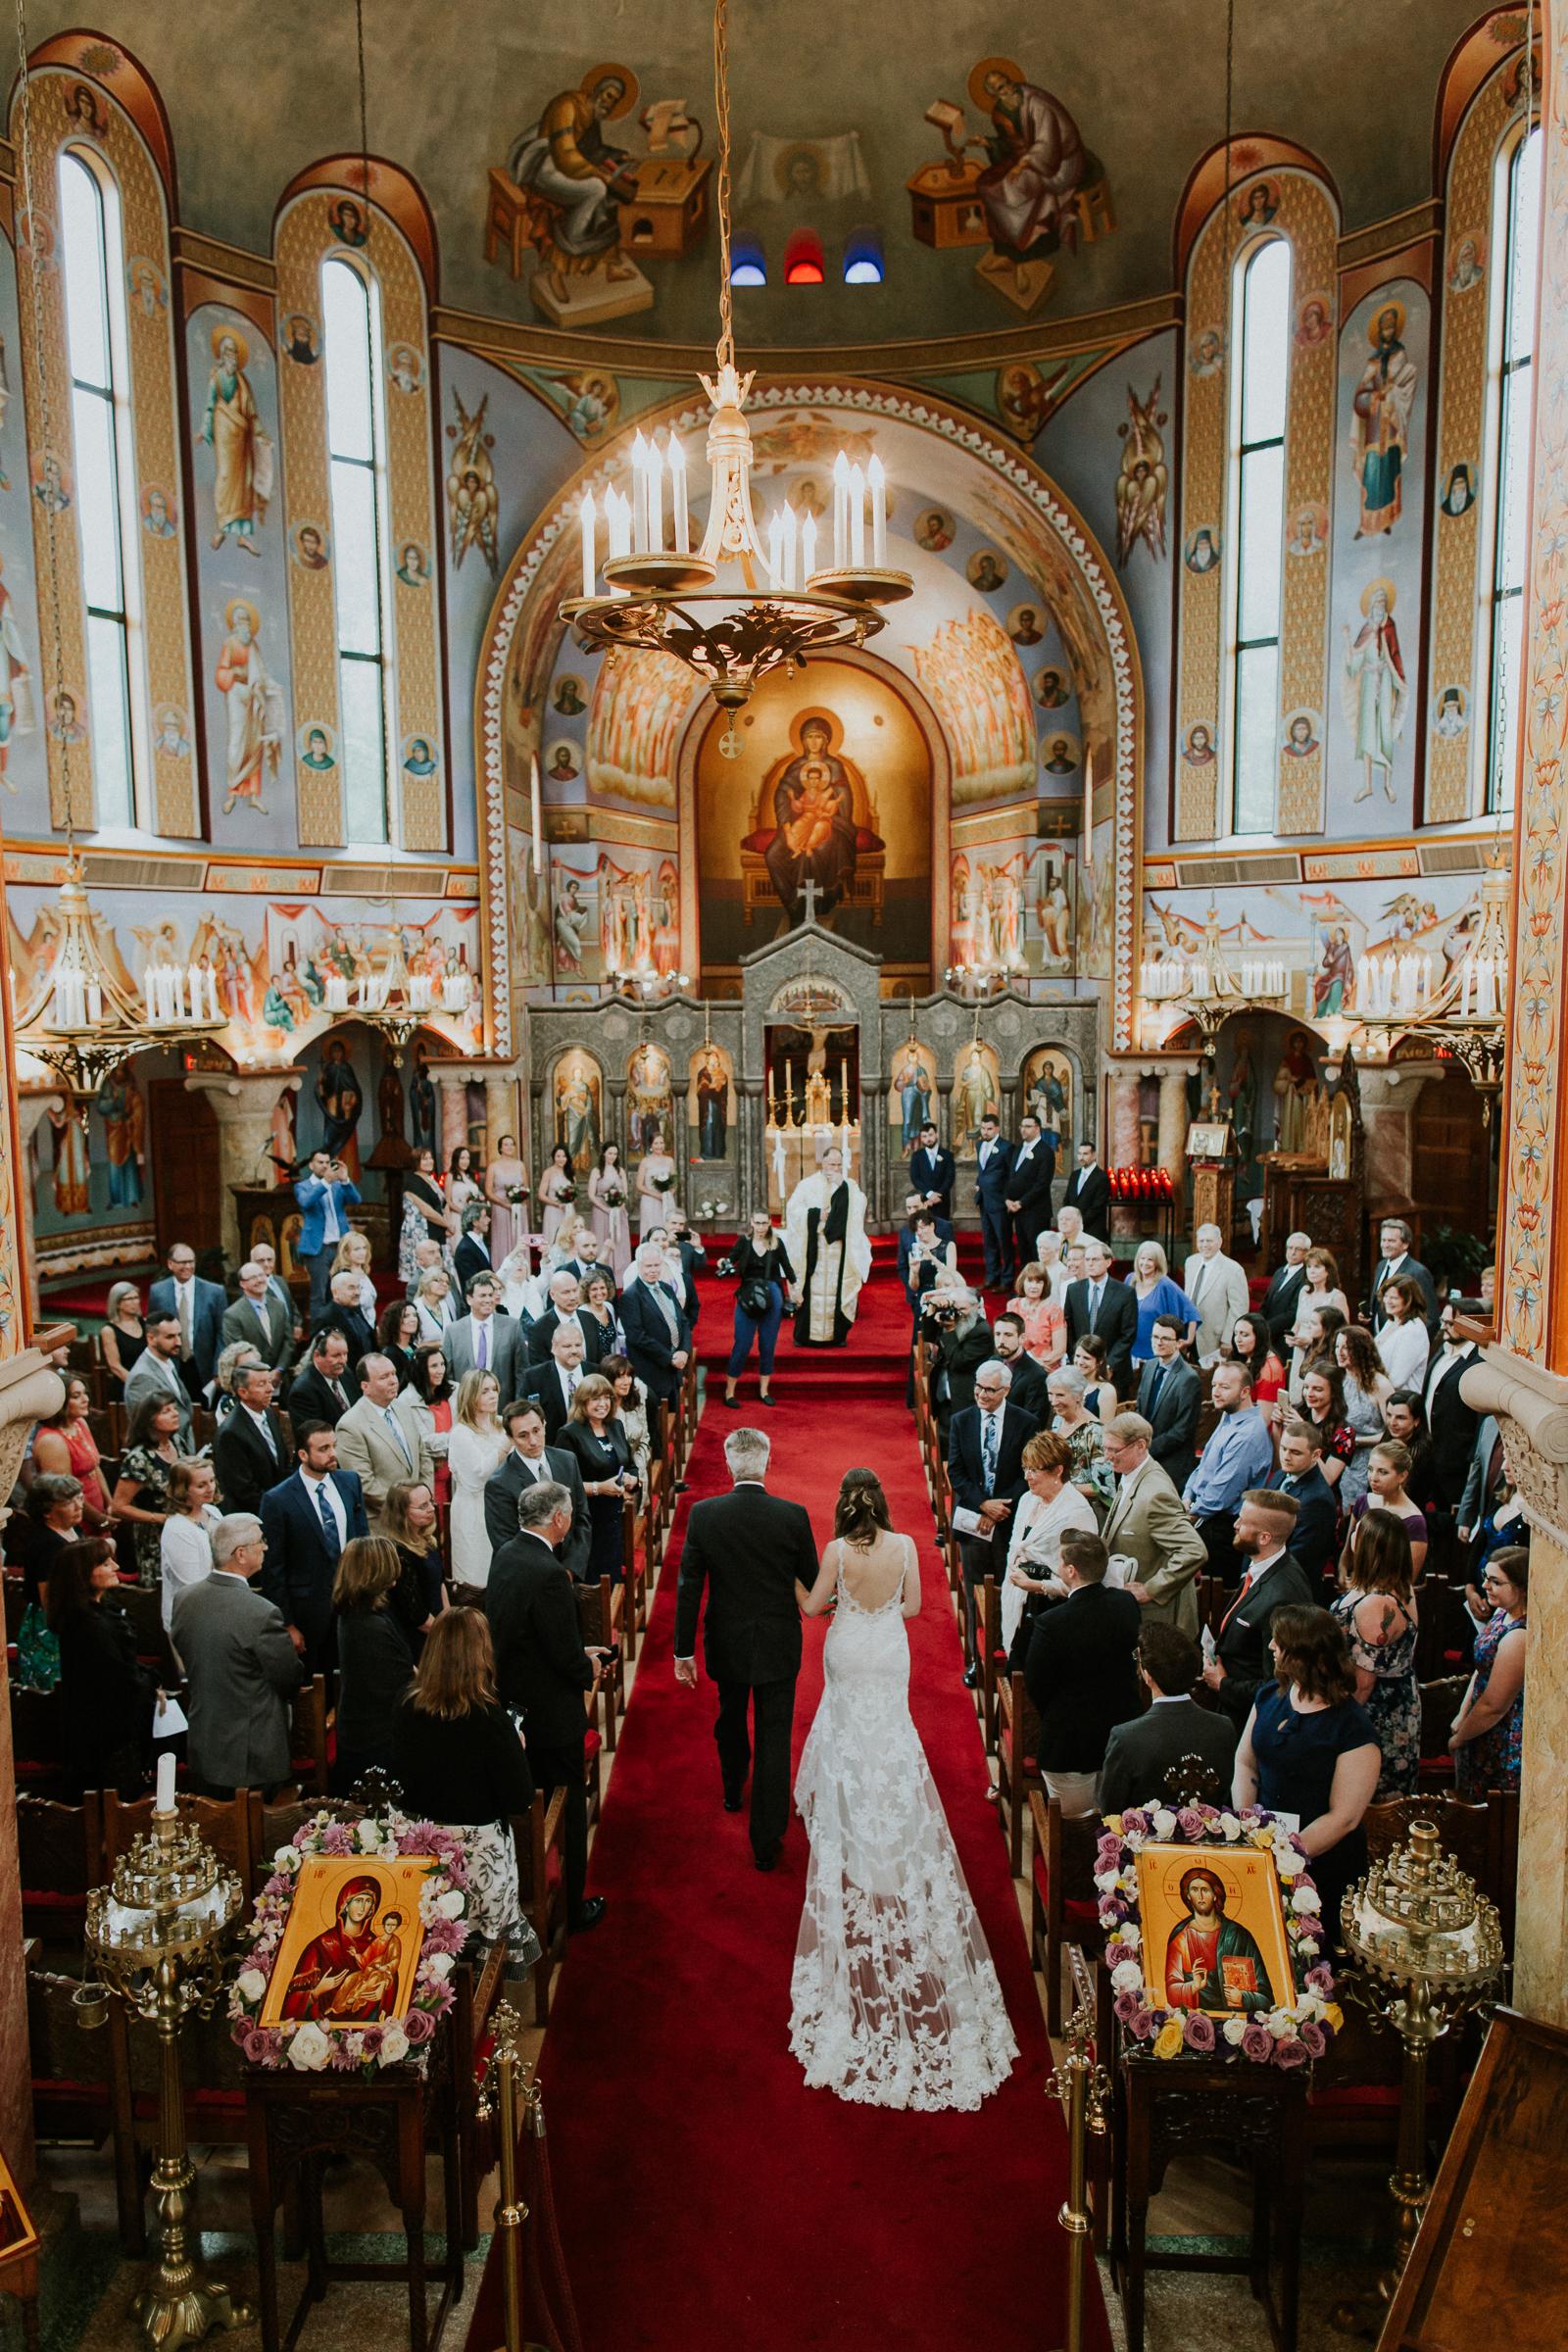 New-York-Documentary-Wedding-Photography-Best-Of-2017-by-Elvira-Kalviste-Photography-96.jpg